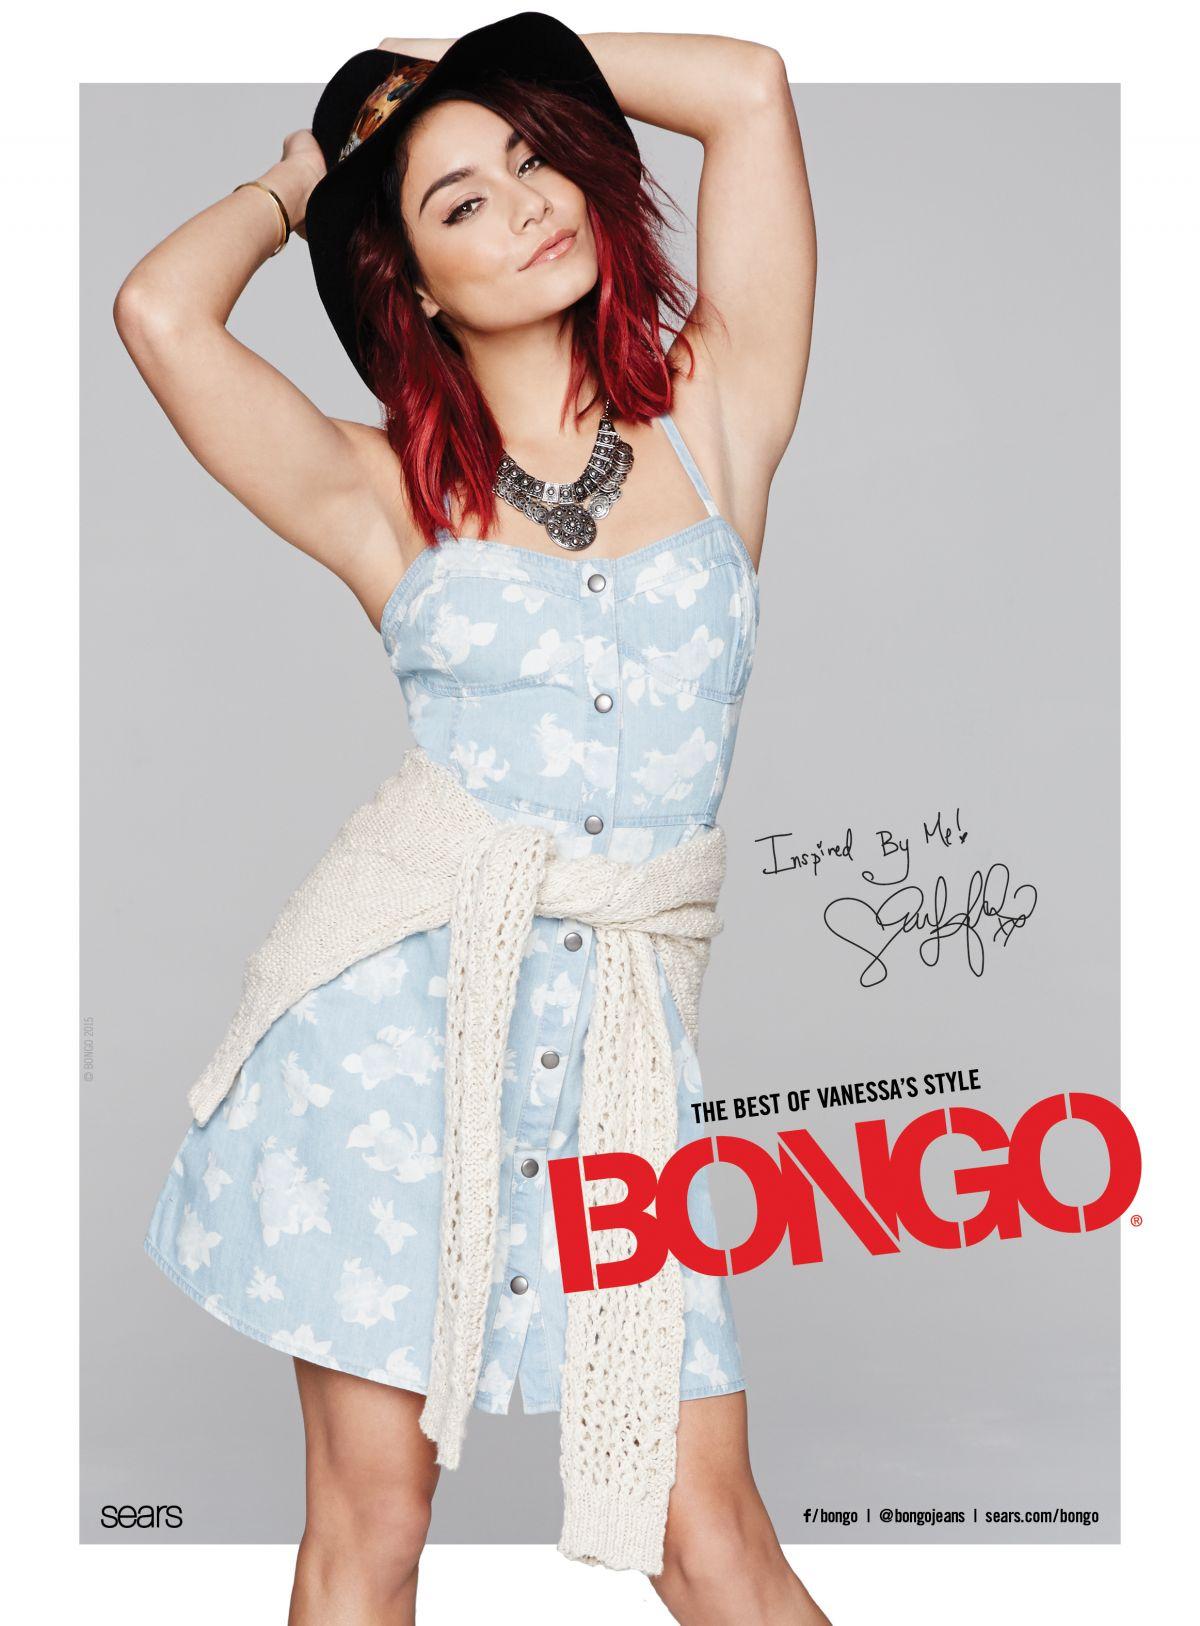 Gorgeous Vanessa Hudgens Photoshoot   GlamGalz.com